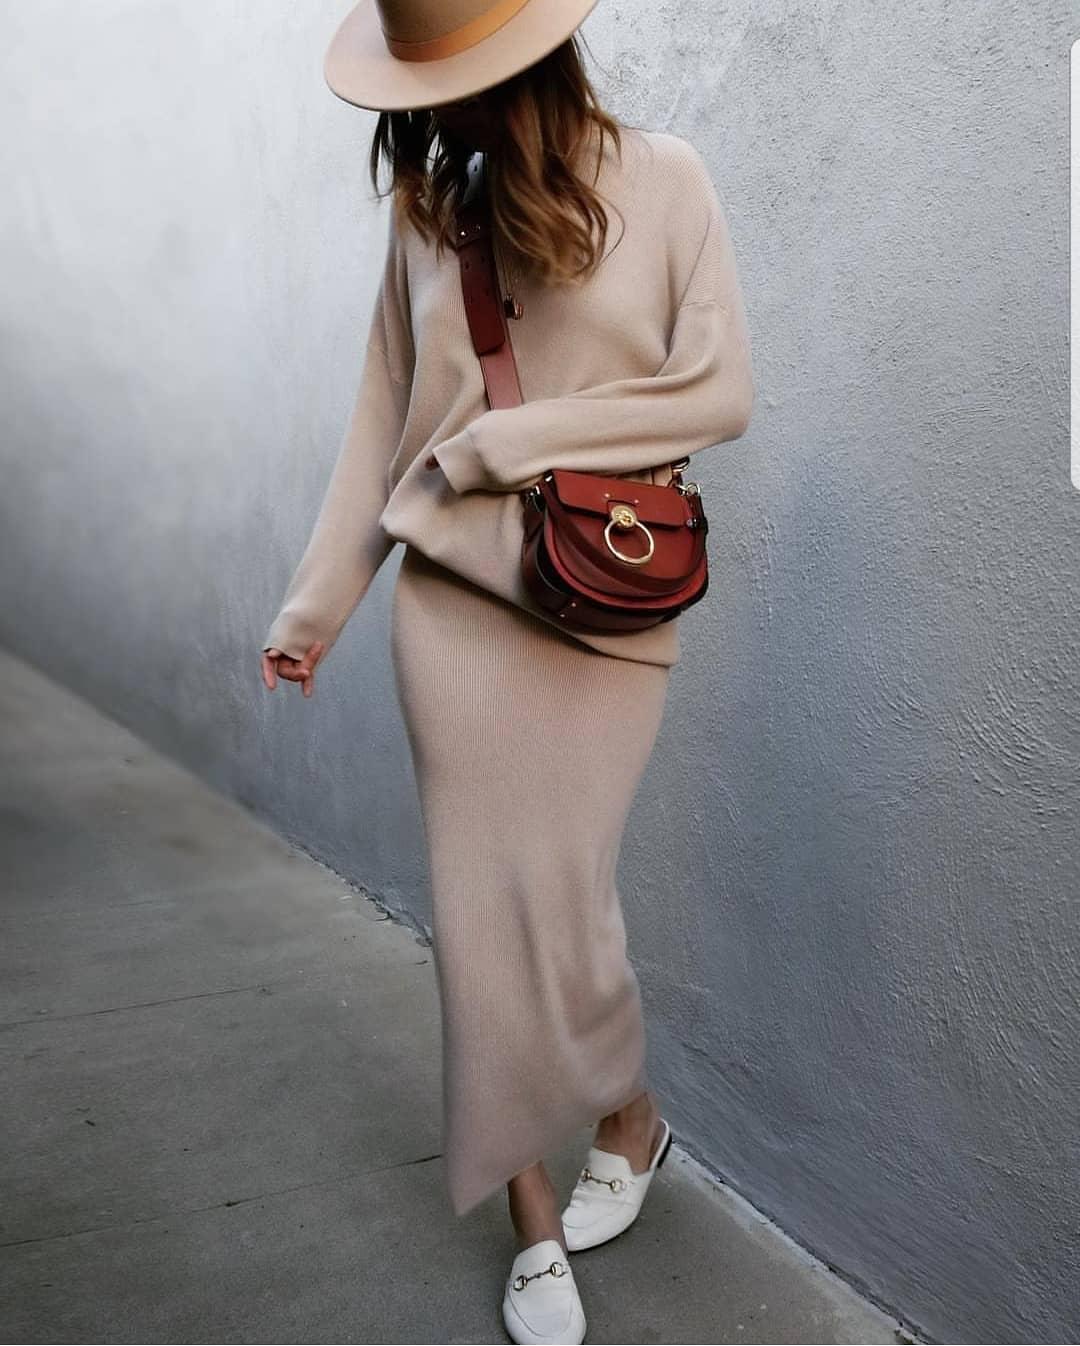 fashion____daily____2_4_2019_1_17_58_270.jpg